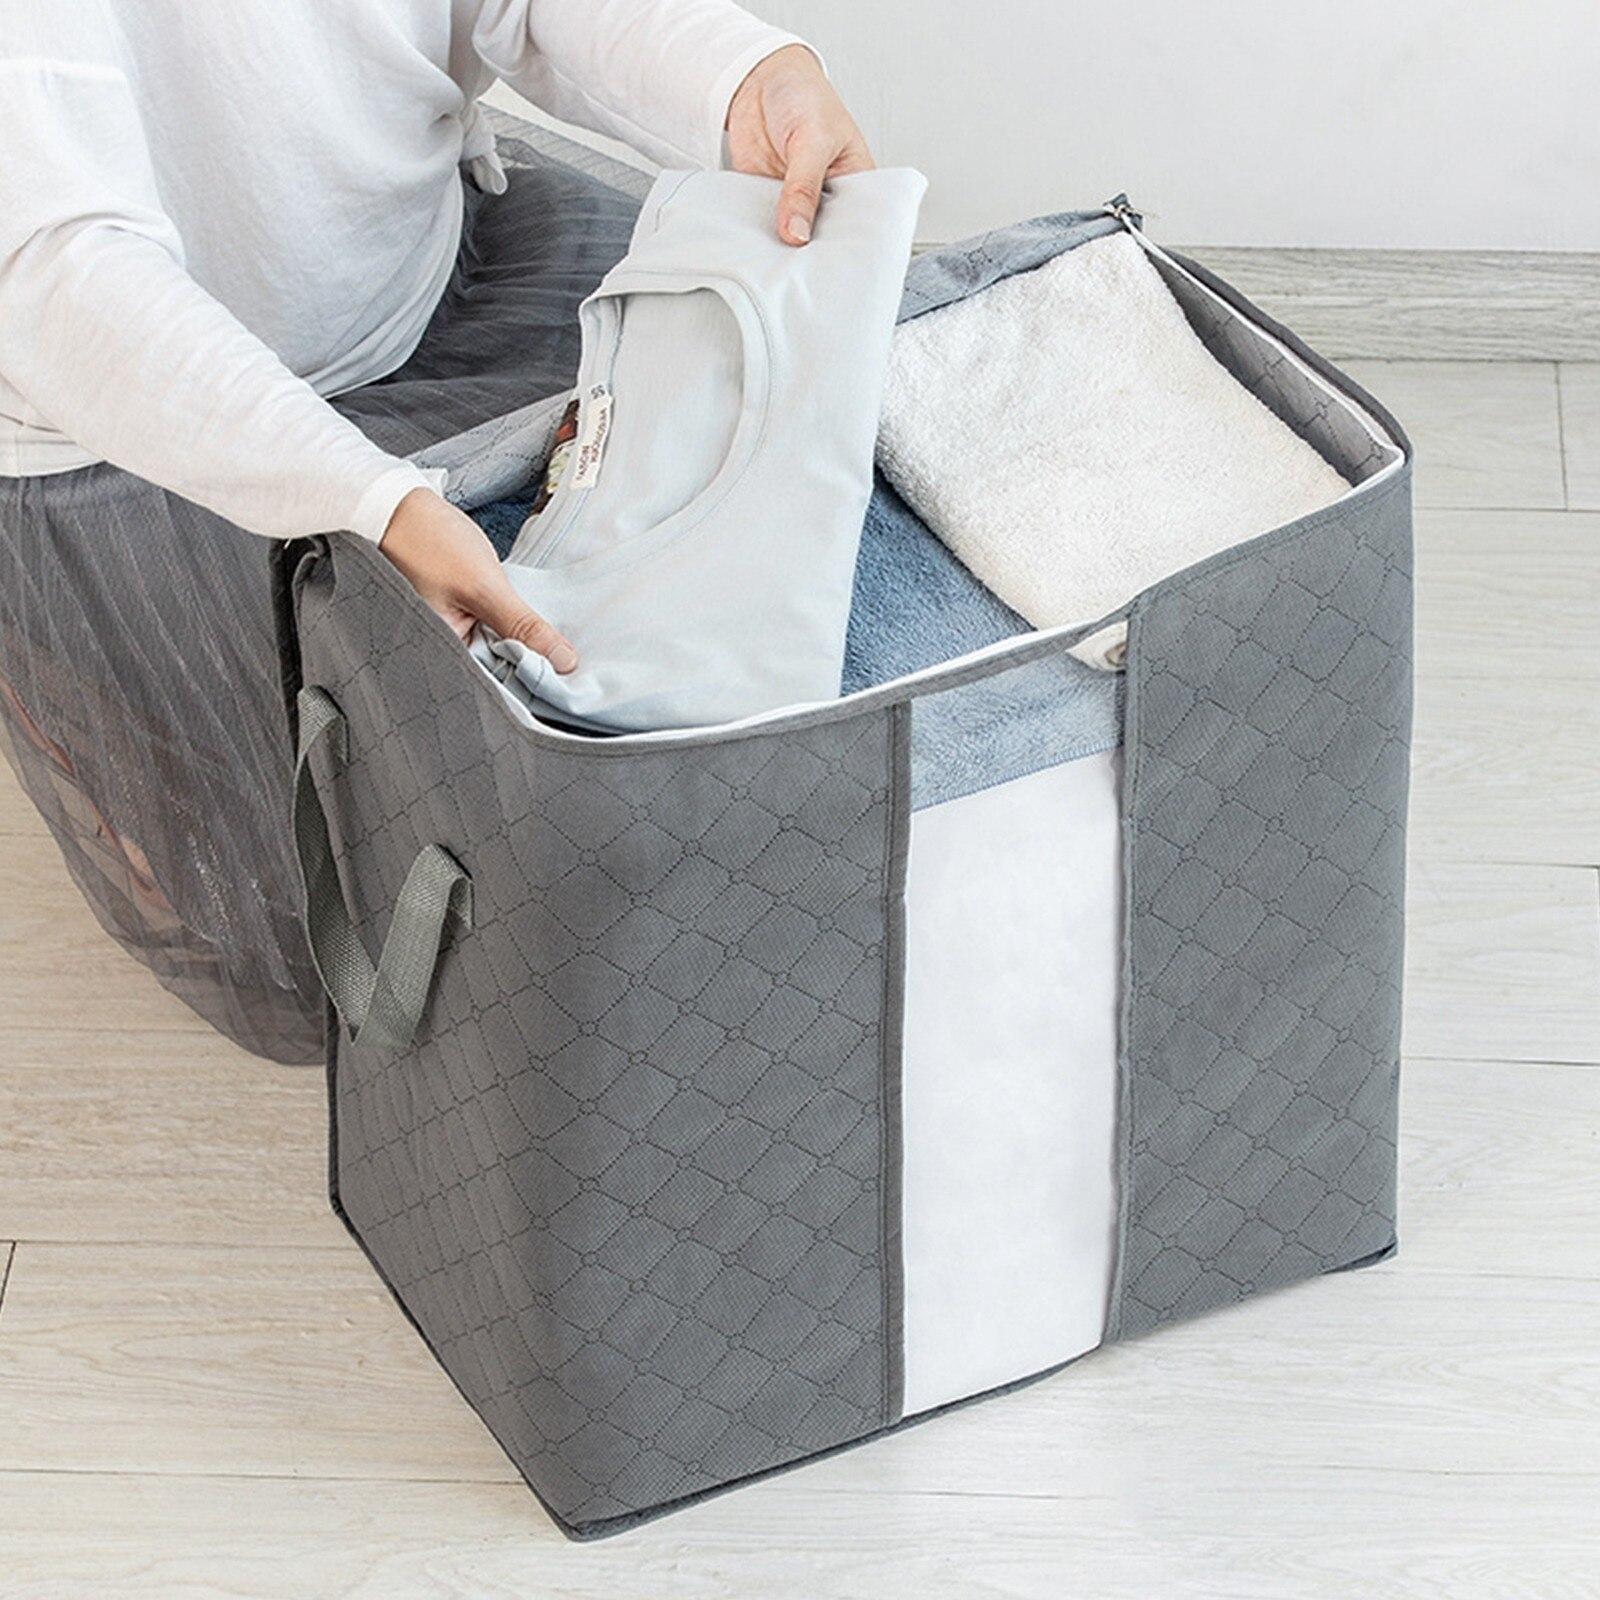 Wholesale Home Storage Foldable Bag New Non-woven Bedding Pillows Quilt Storage Bag Clothes Storage Bag Organizer Large